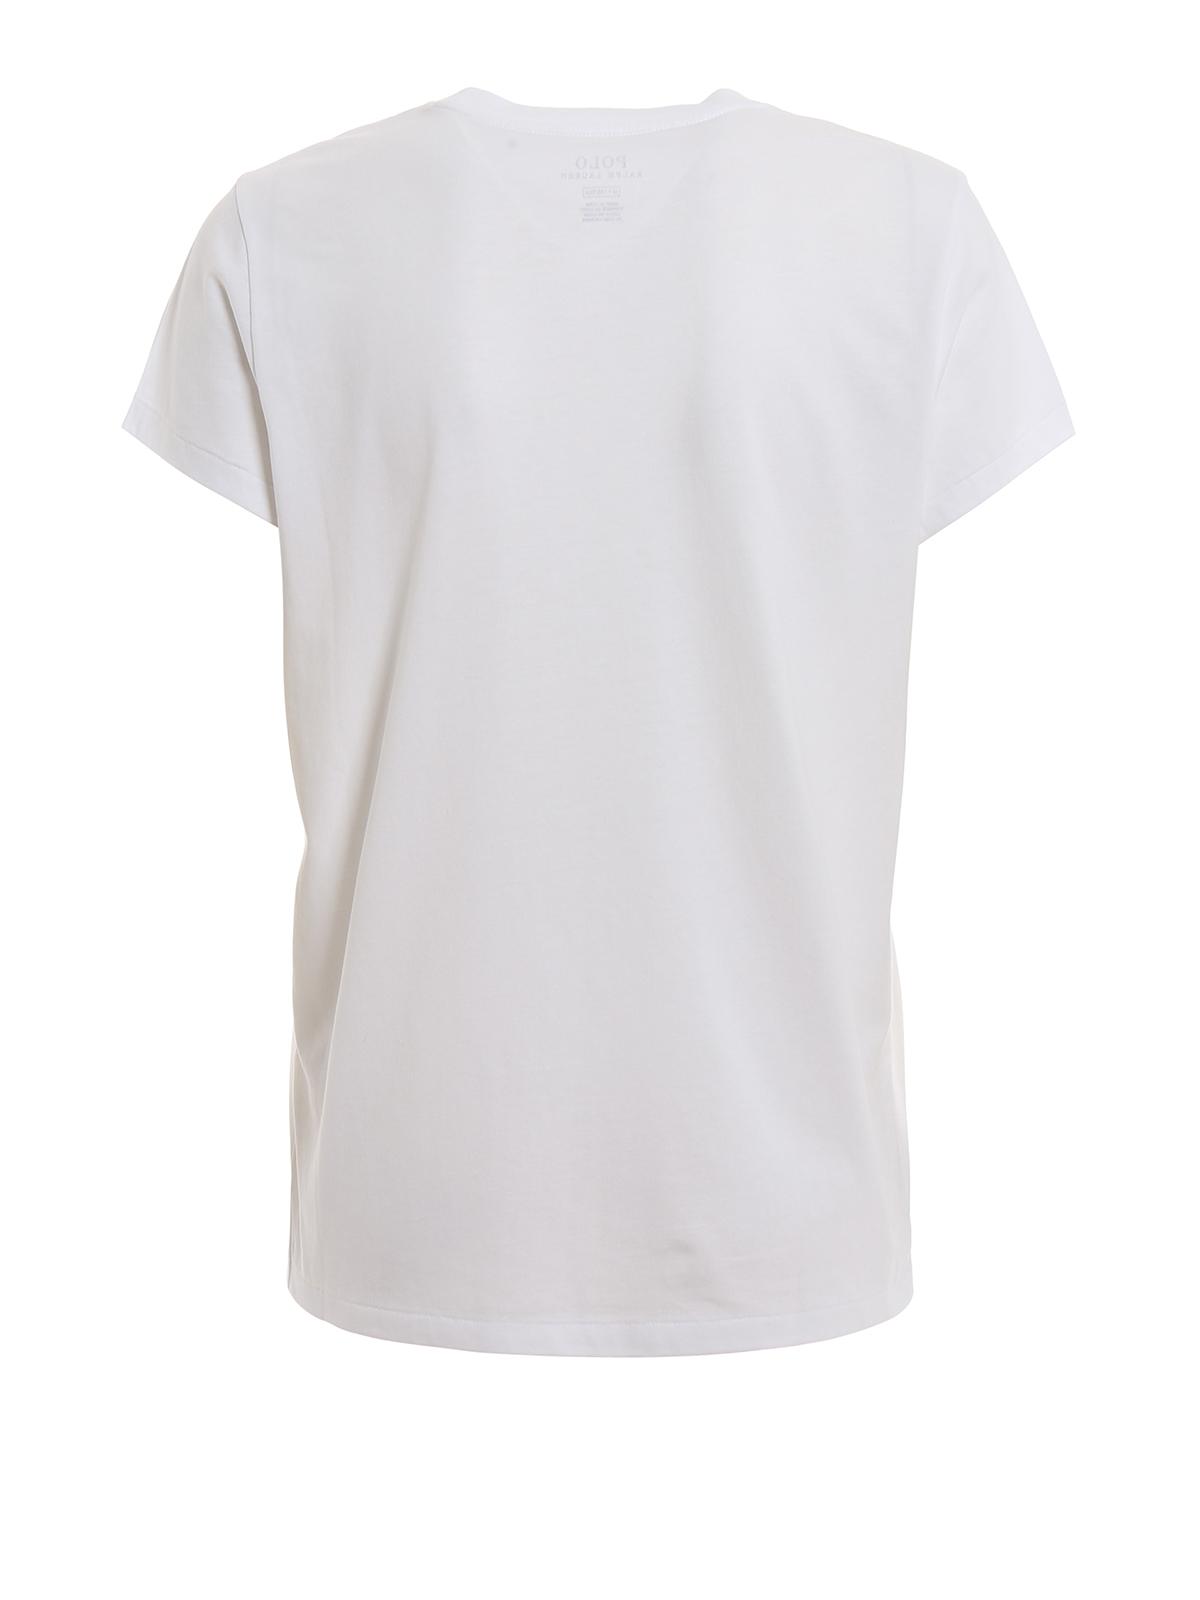 reputable site 39610 254bb Polo Ralph Lauren - T-Shirt - Weiß - T-shirts - 211744519001 ...